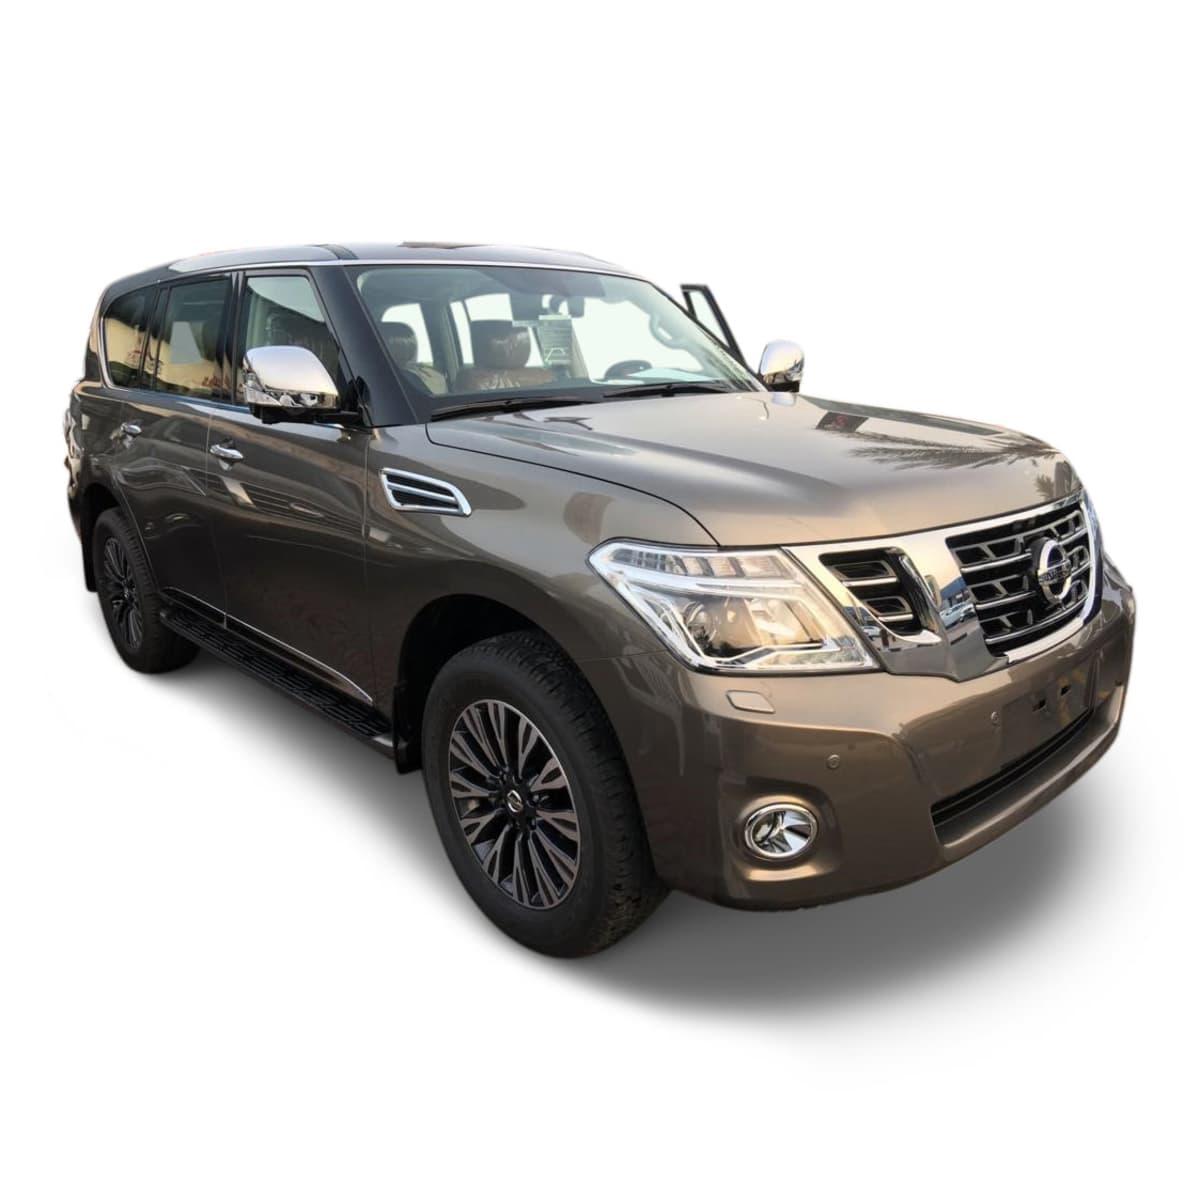 2018 Nissan Patrol Se Platinum 4